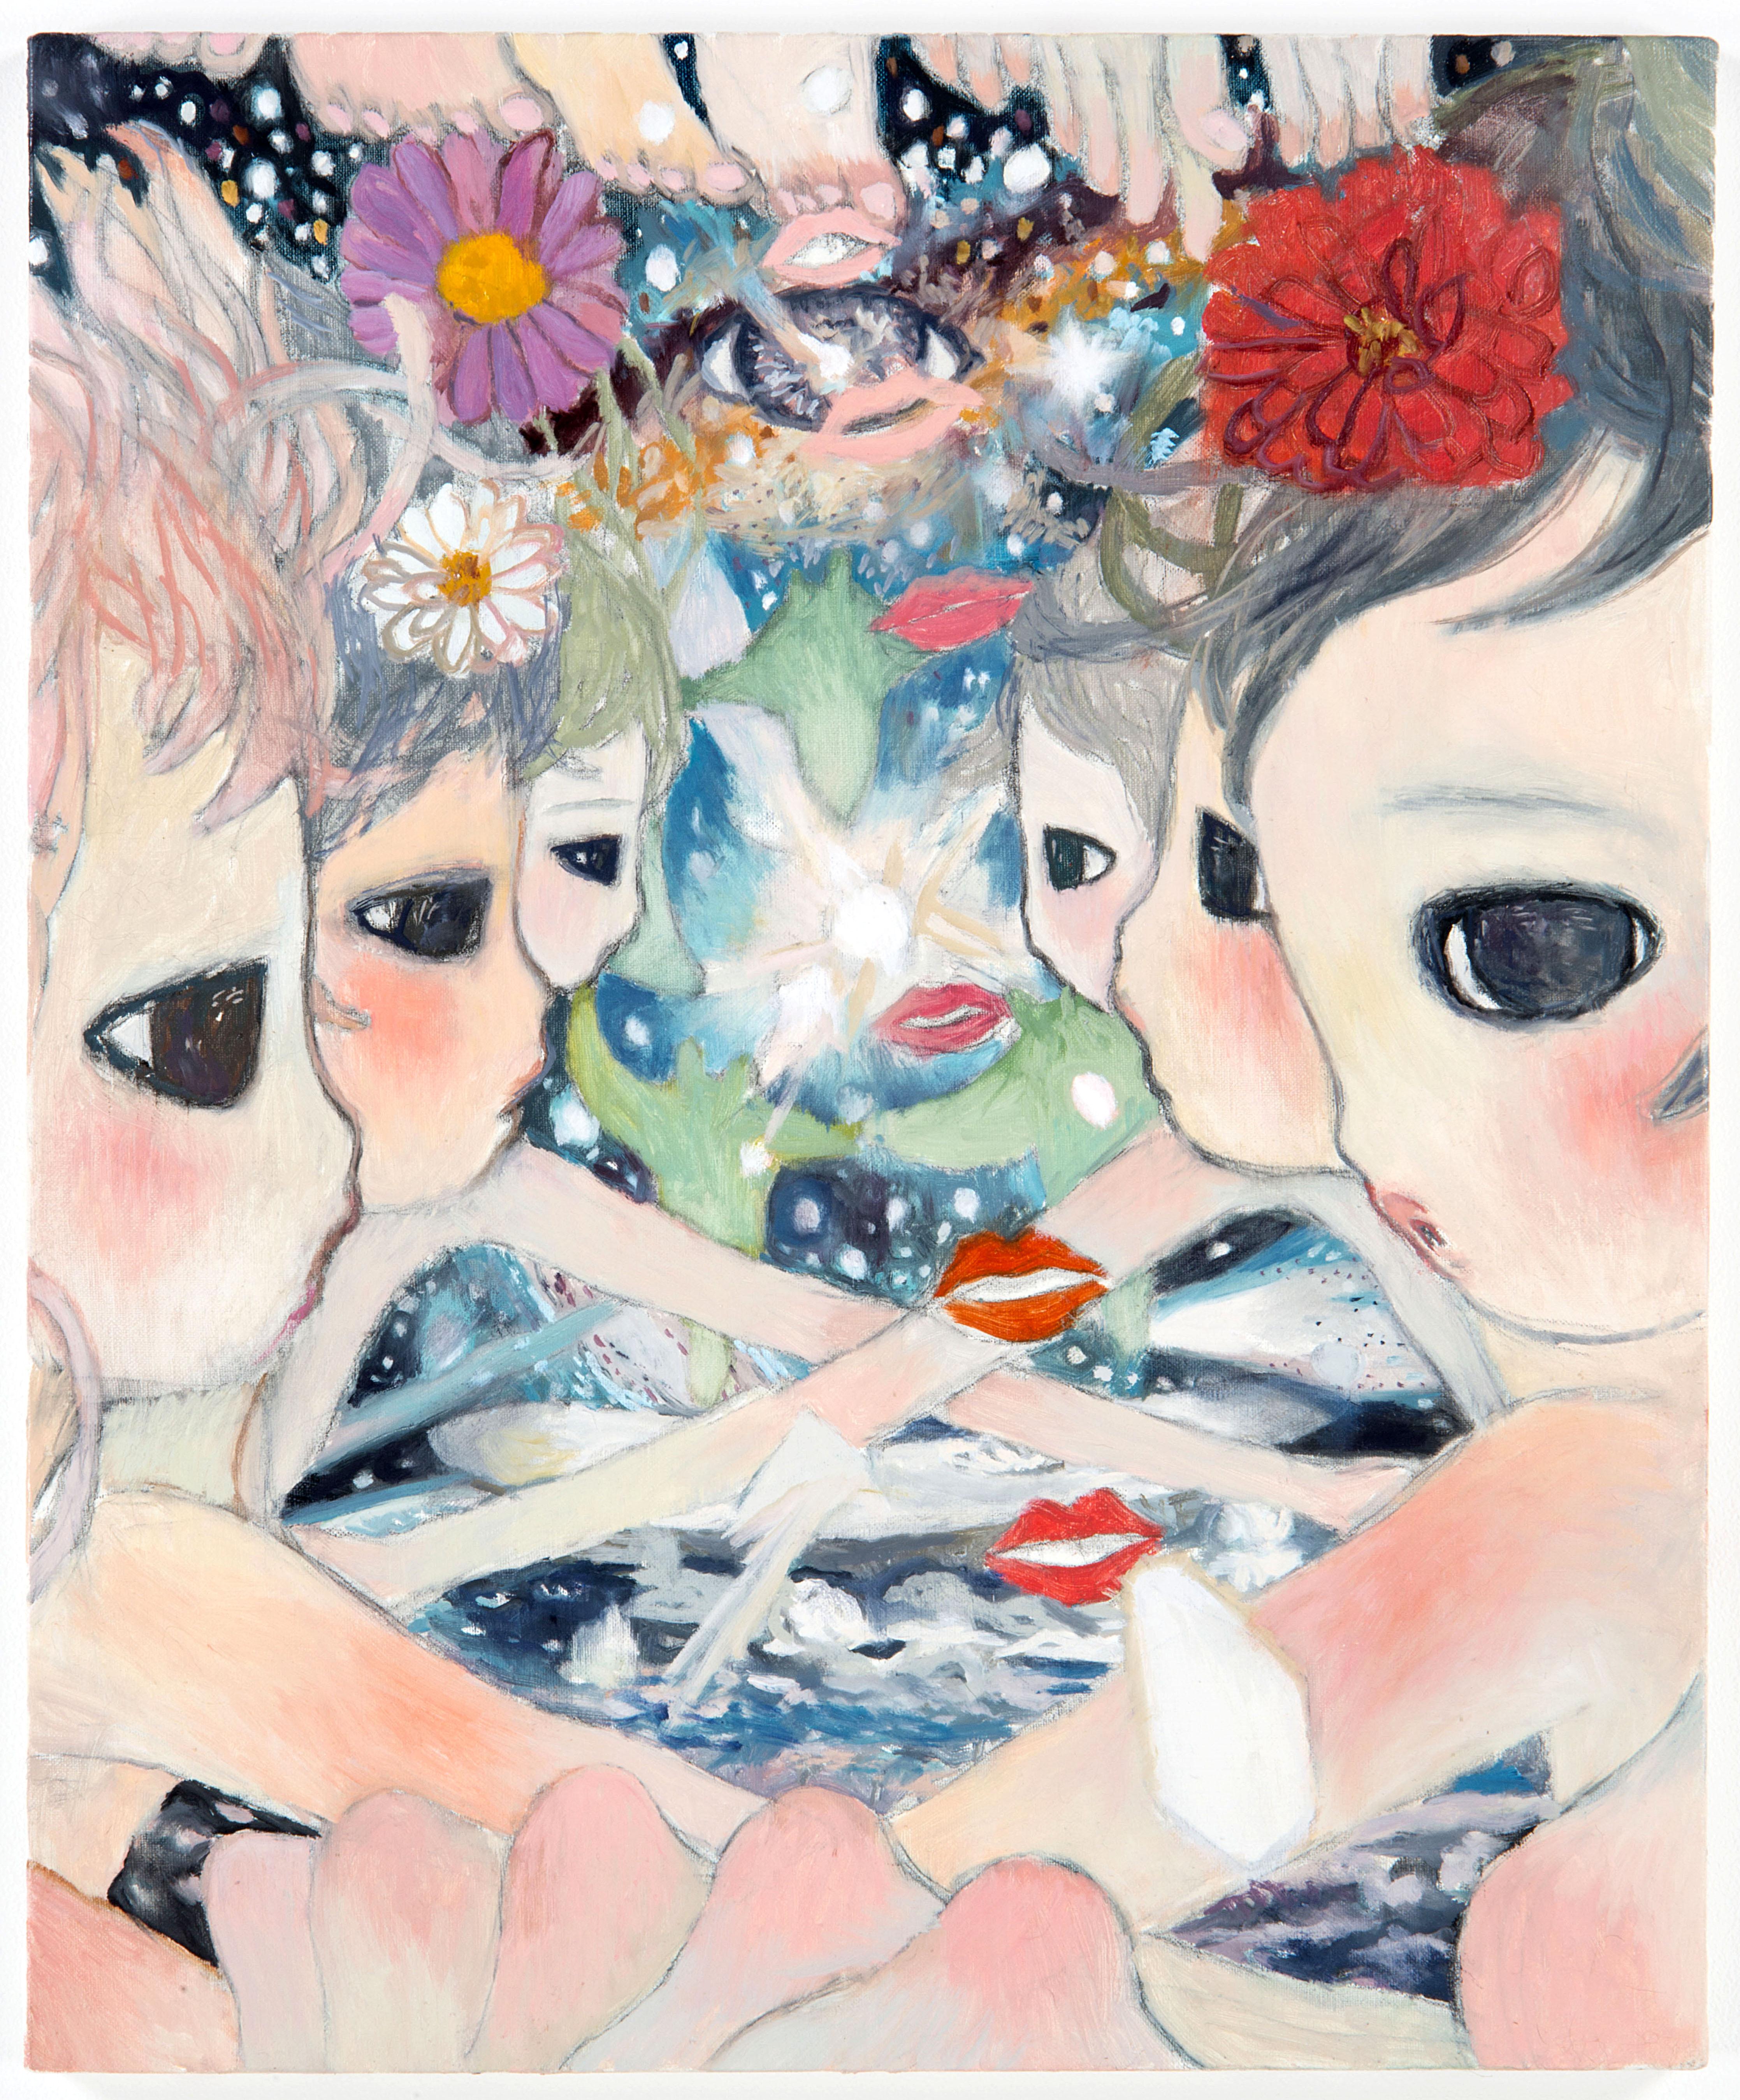 Aya Takano piece